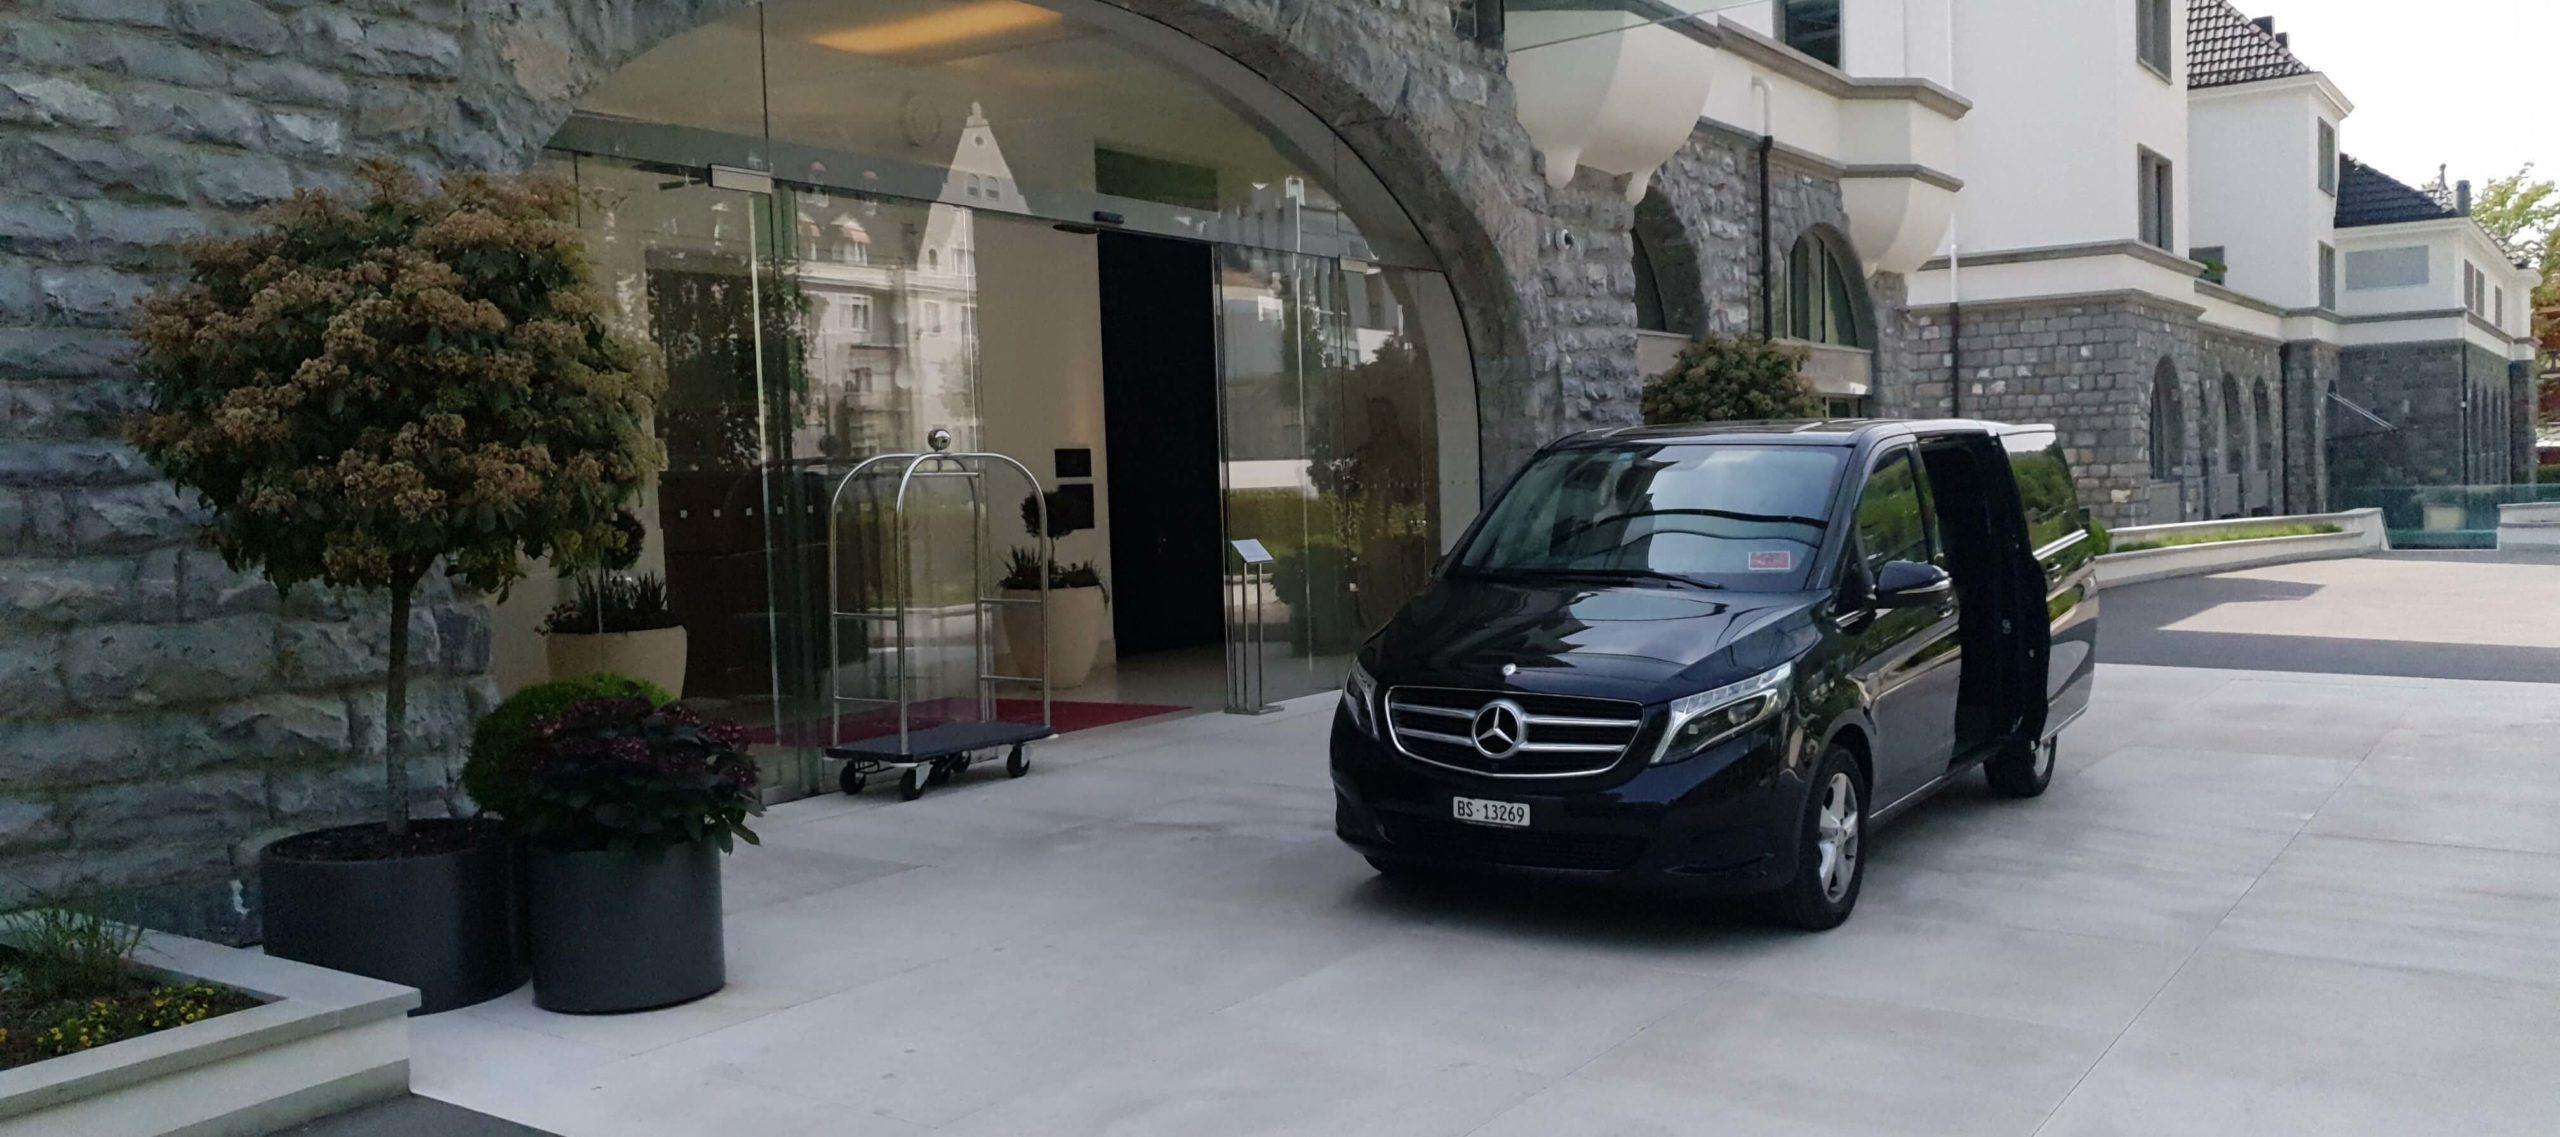 traserbas van in front of zurich hotel ready for private van service in zurich